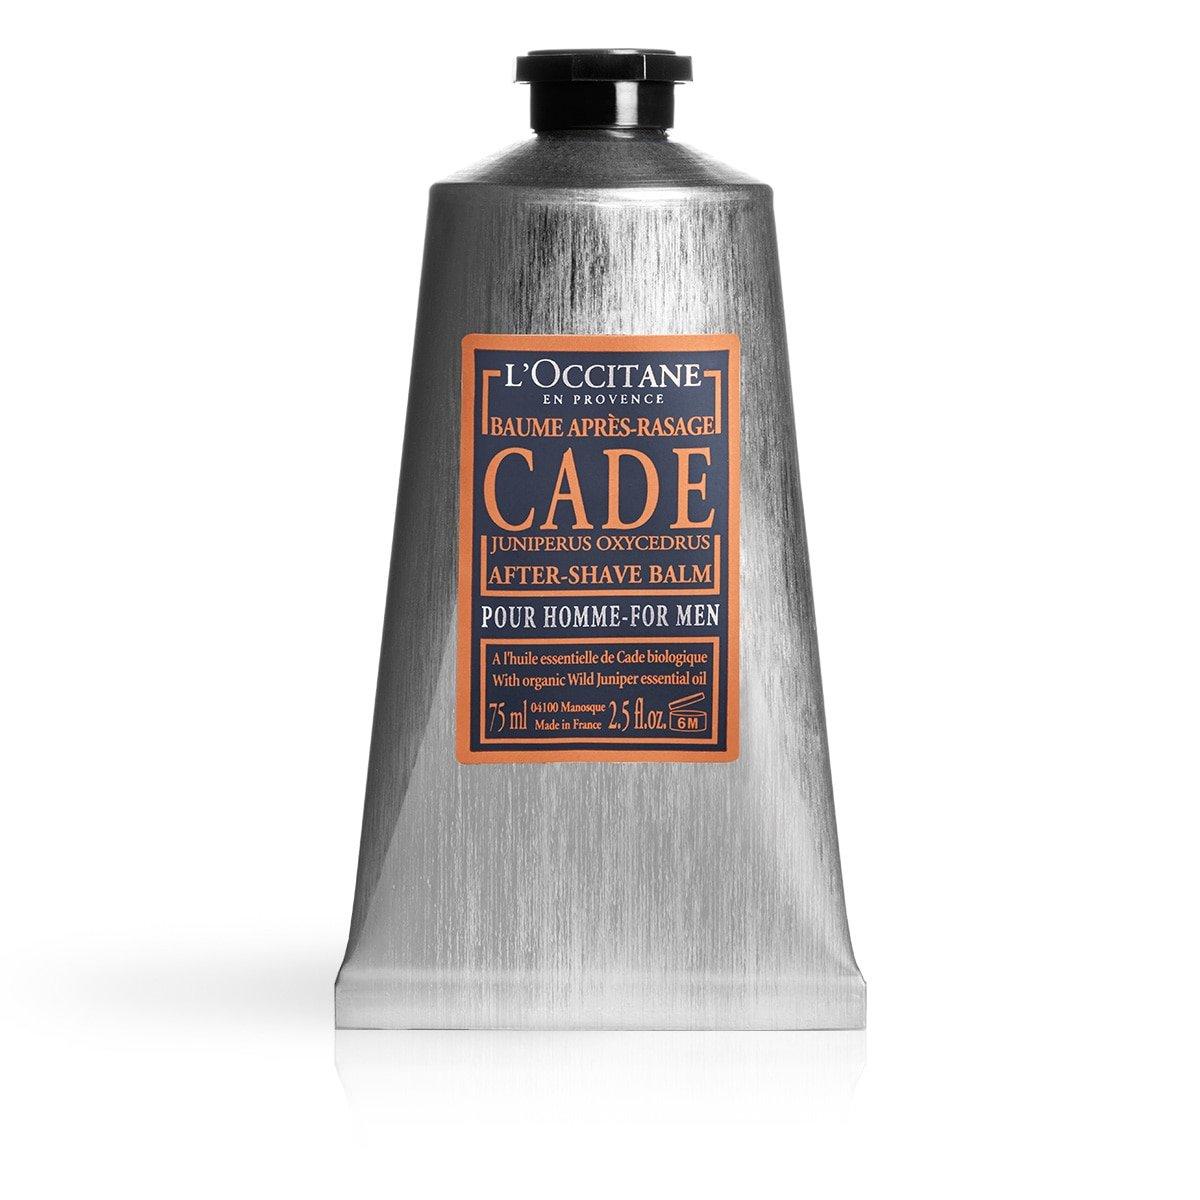 Cade After Shave Balm - 75ml. L'OCCITANE 20AR075H16